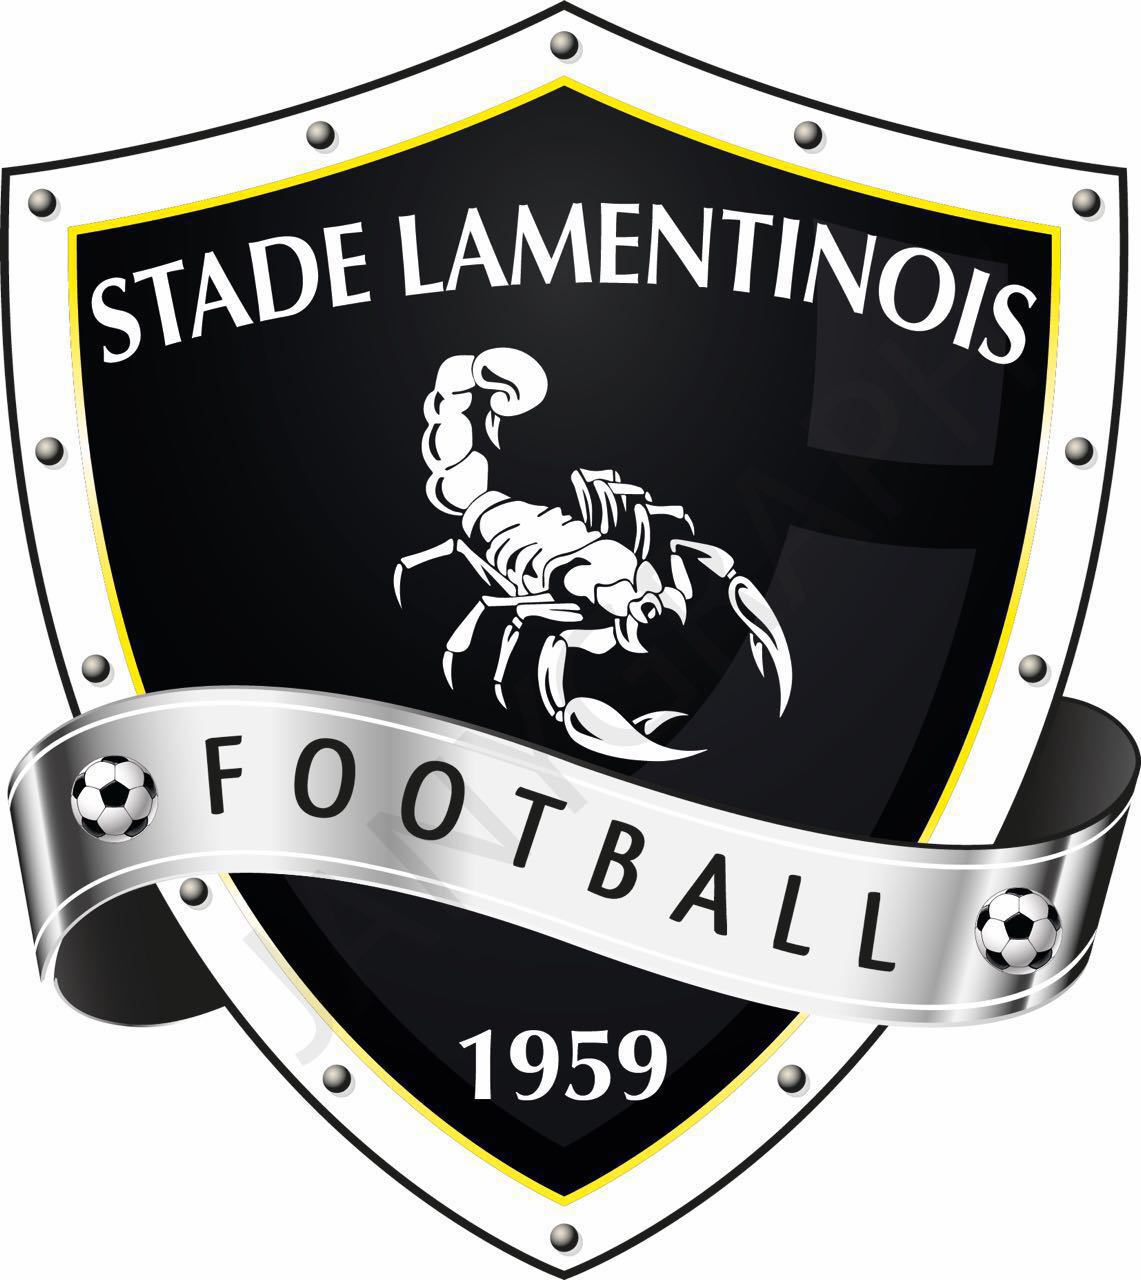 LOGO STADE LAMENTINOIS - FOOT